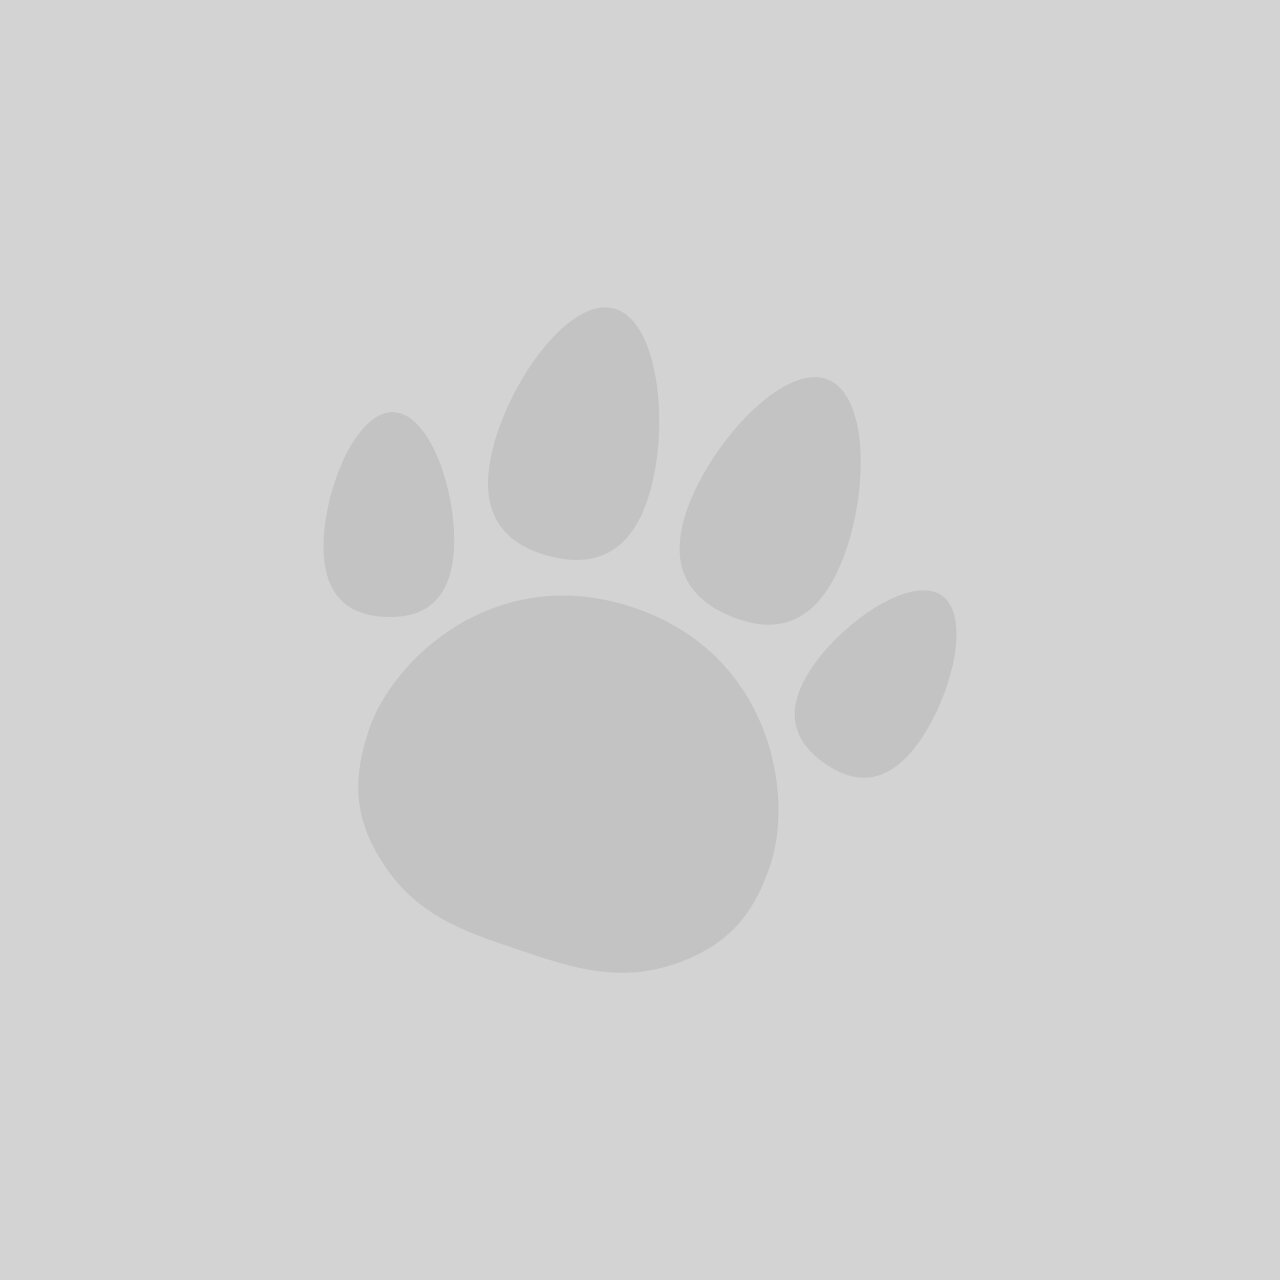 Kong Jumbler Football (size options)